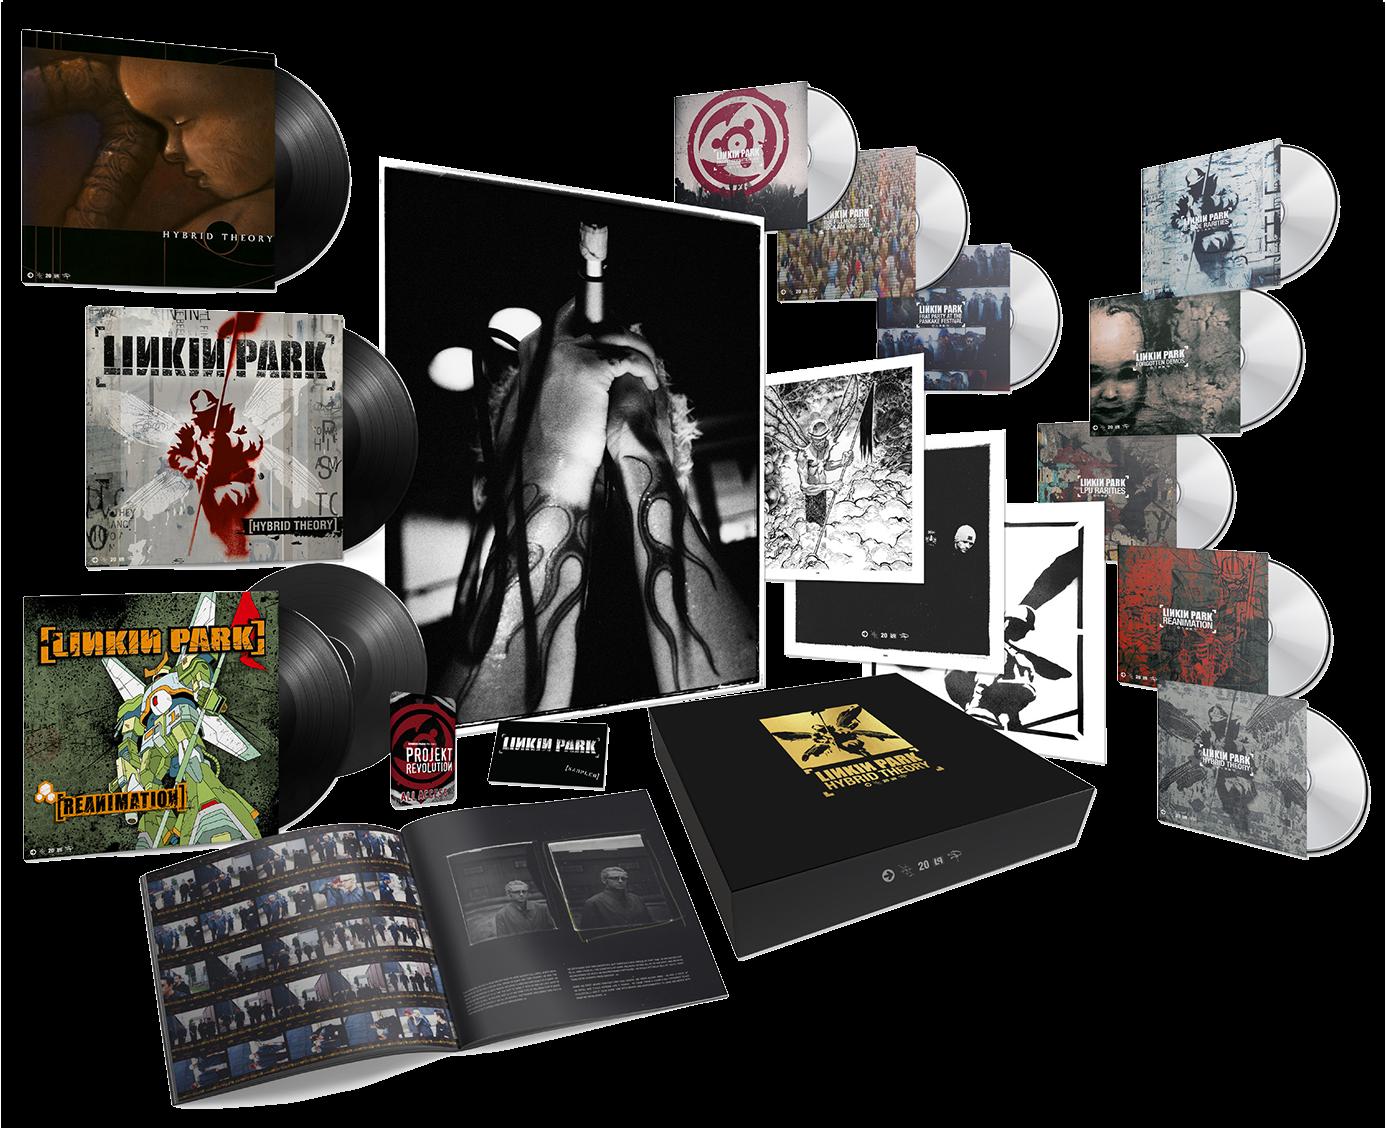 Linkin Park - Hybrid Theory (20th Anniversary Super Deluxe) Boxset